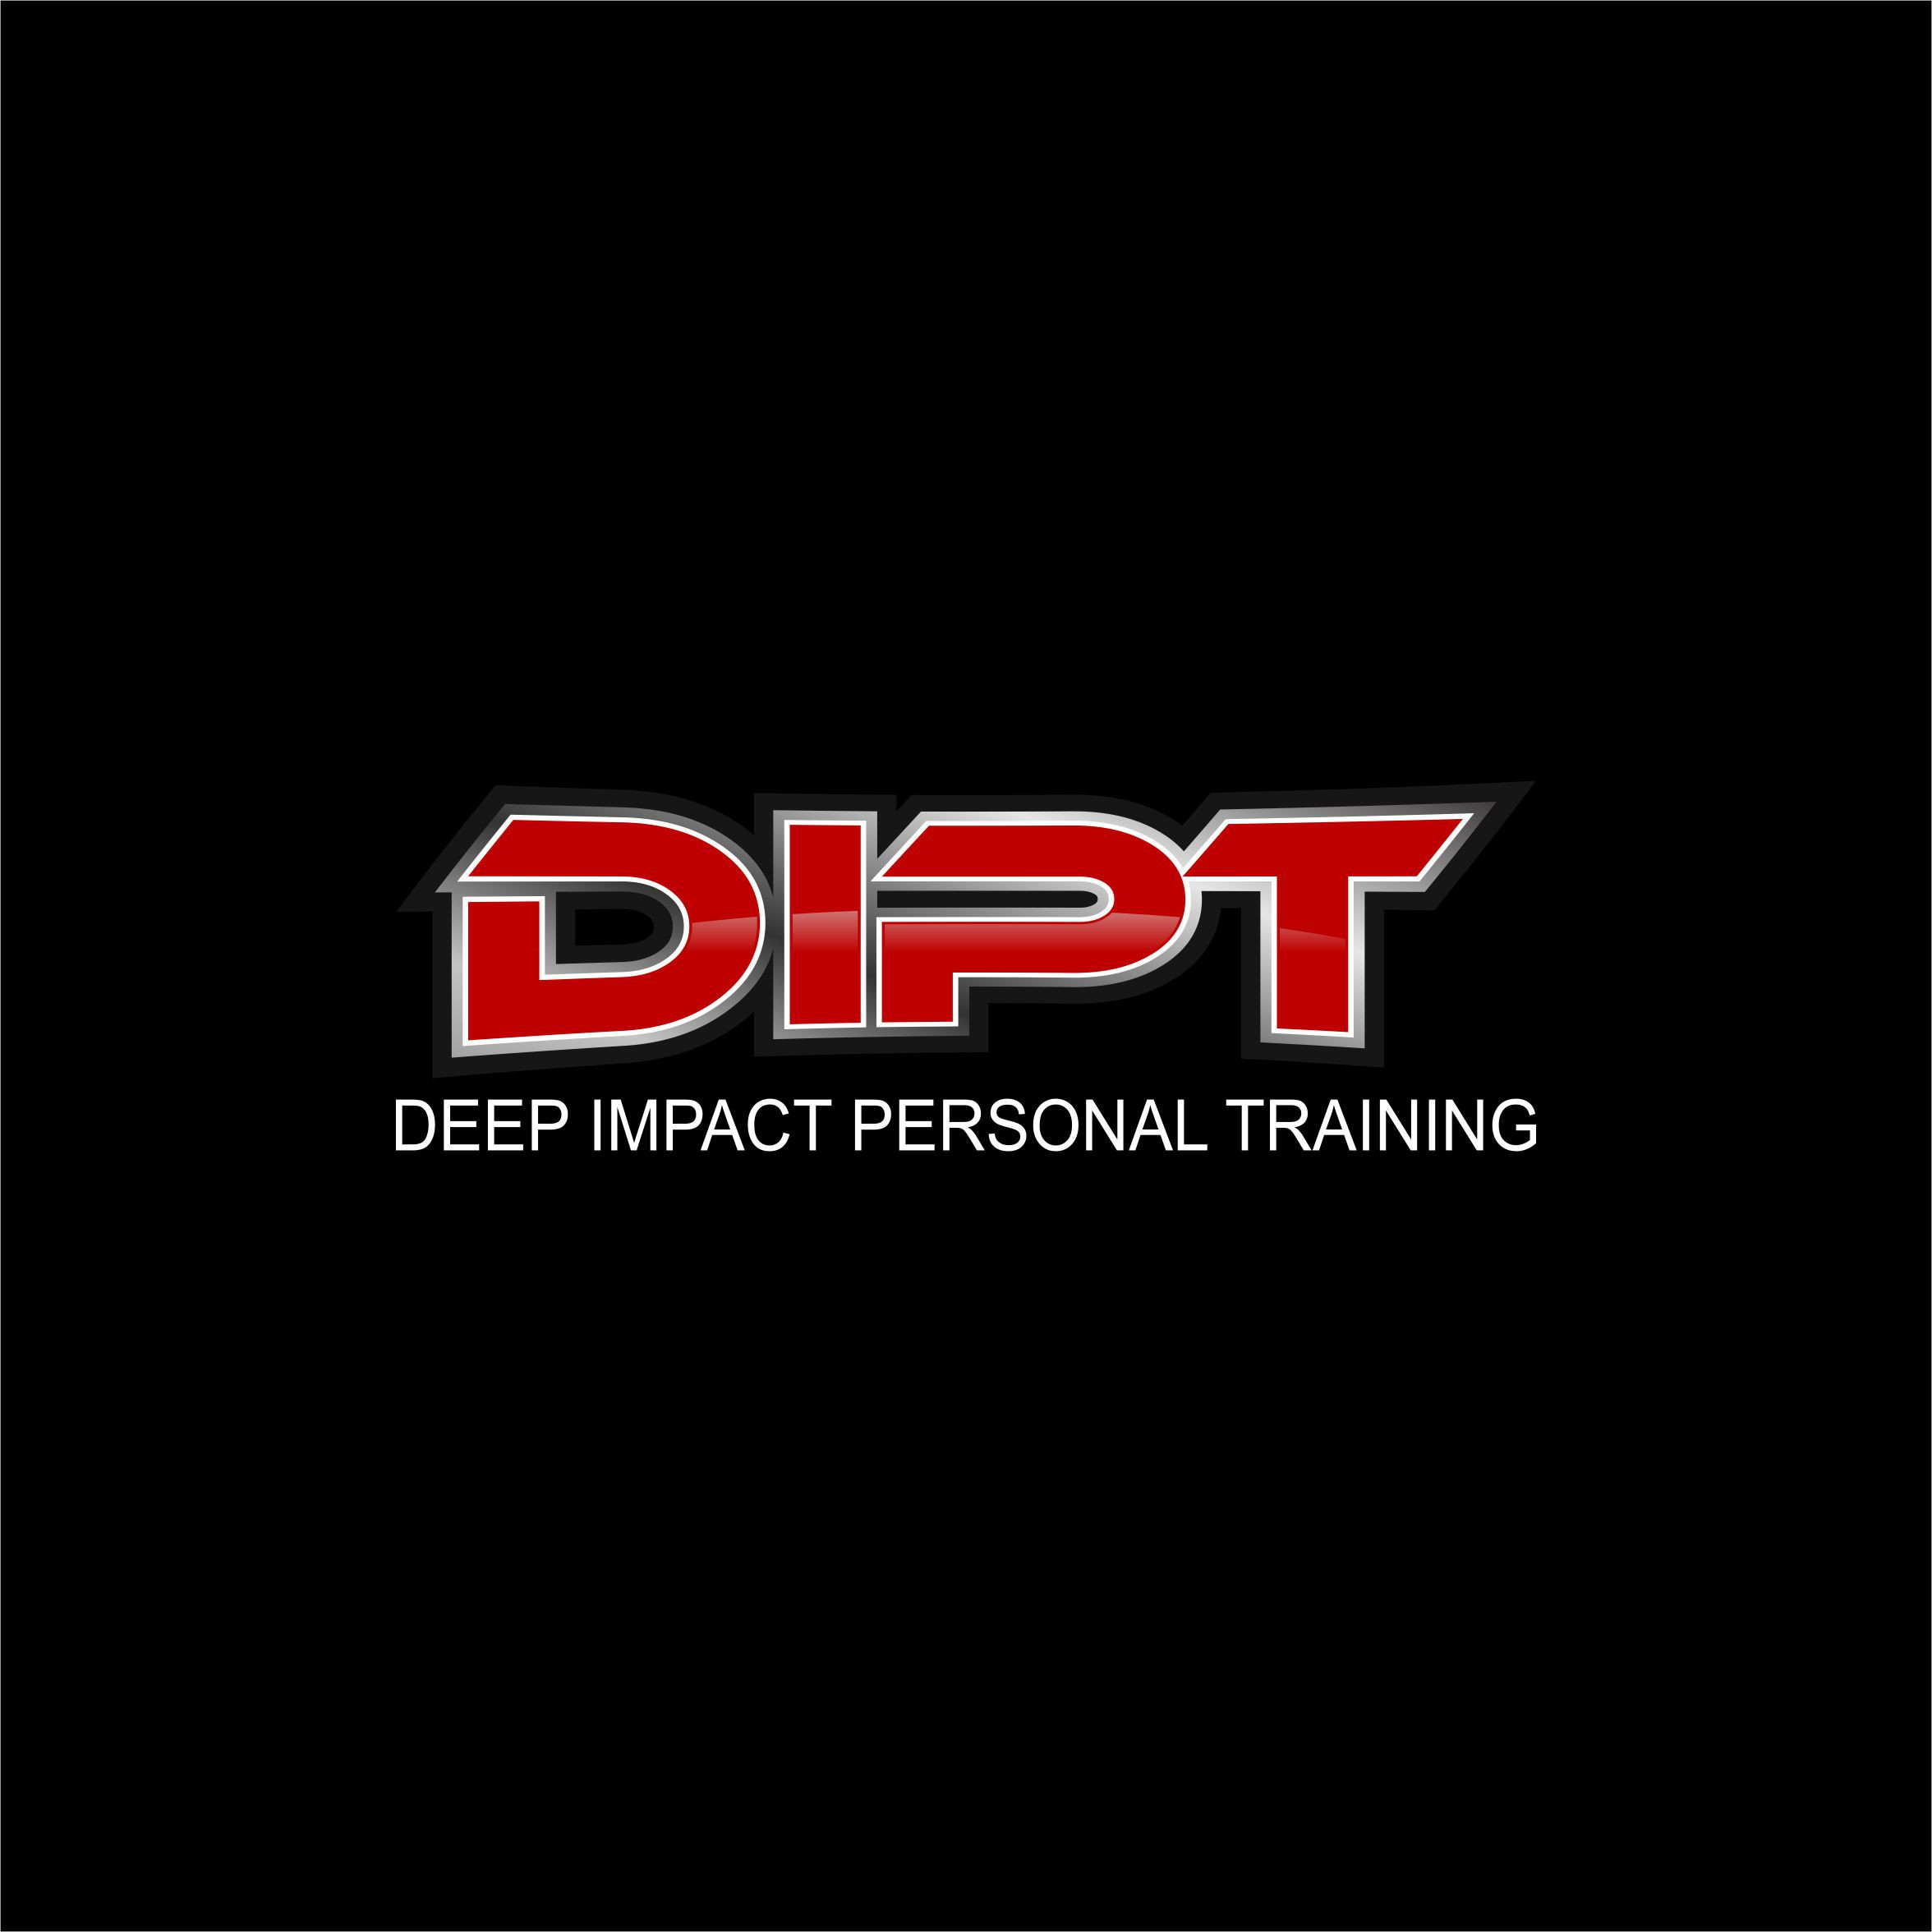 DIPT - Deep Impact Personal Training